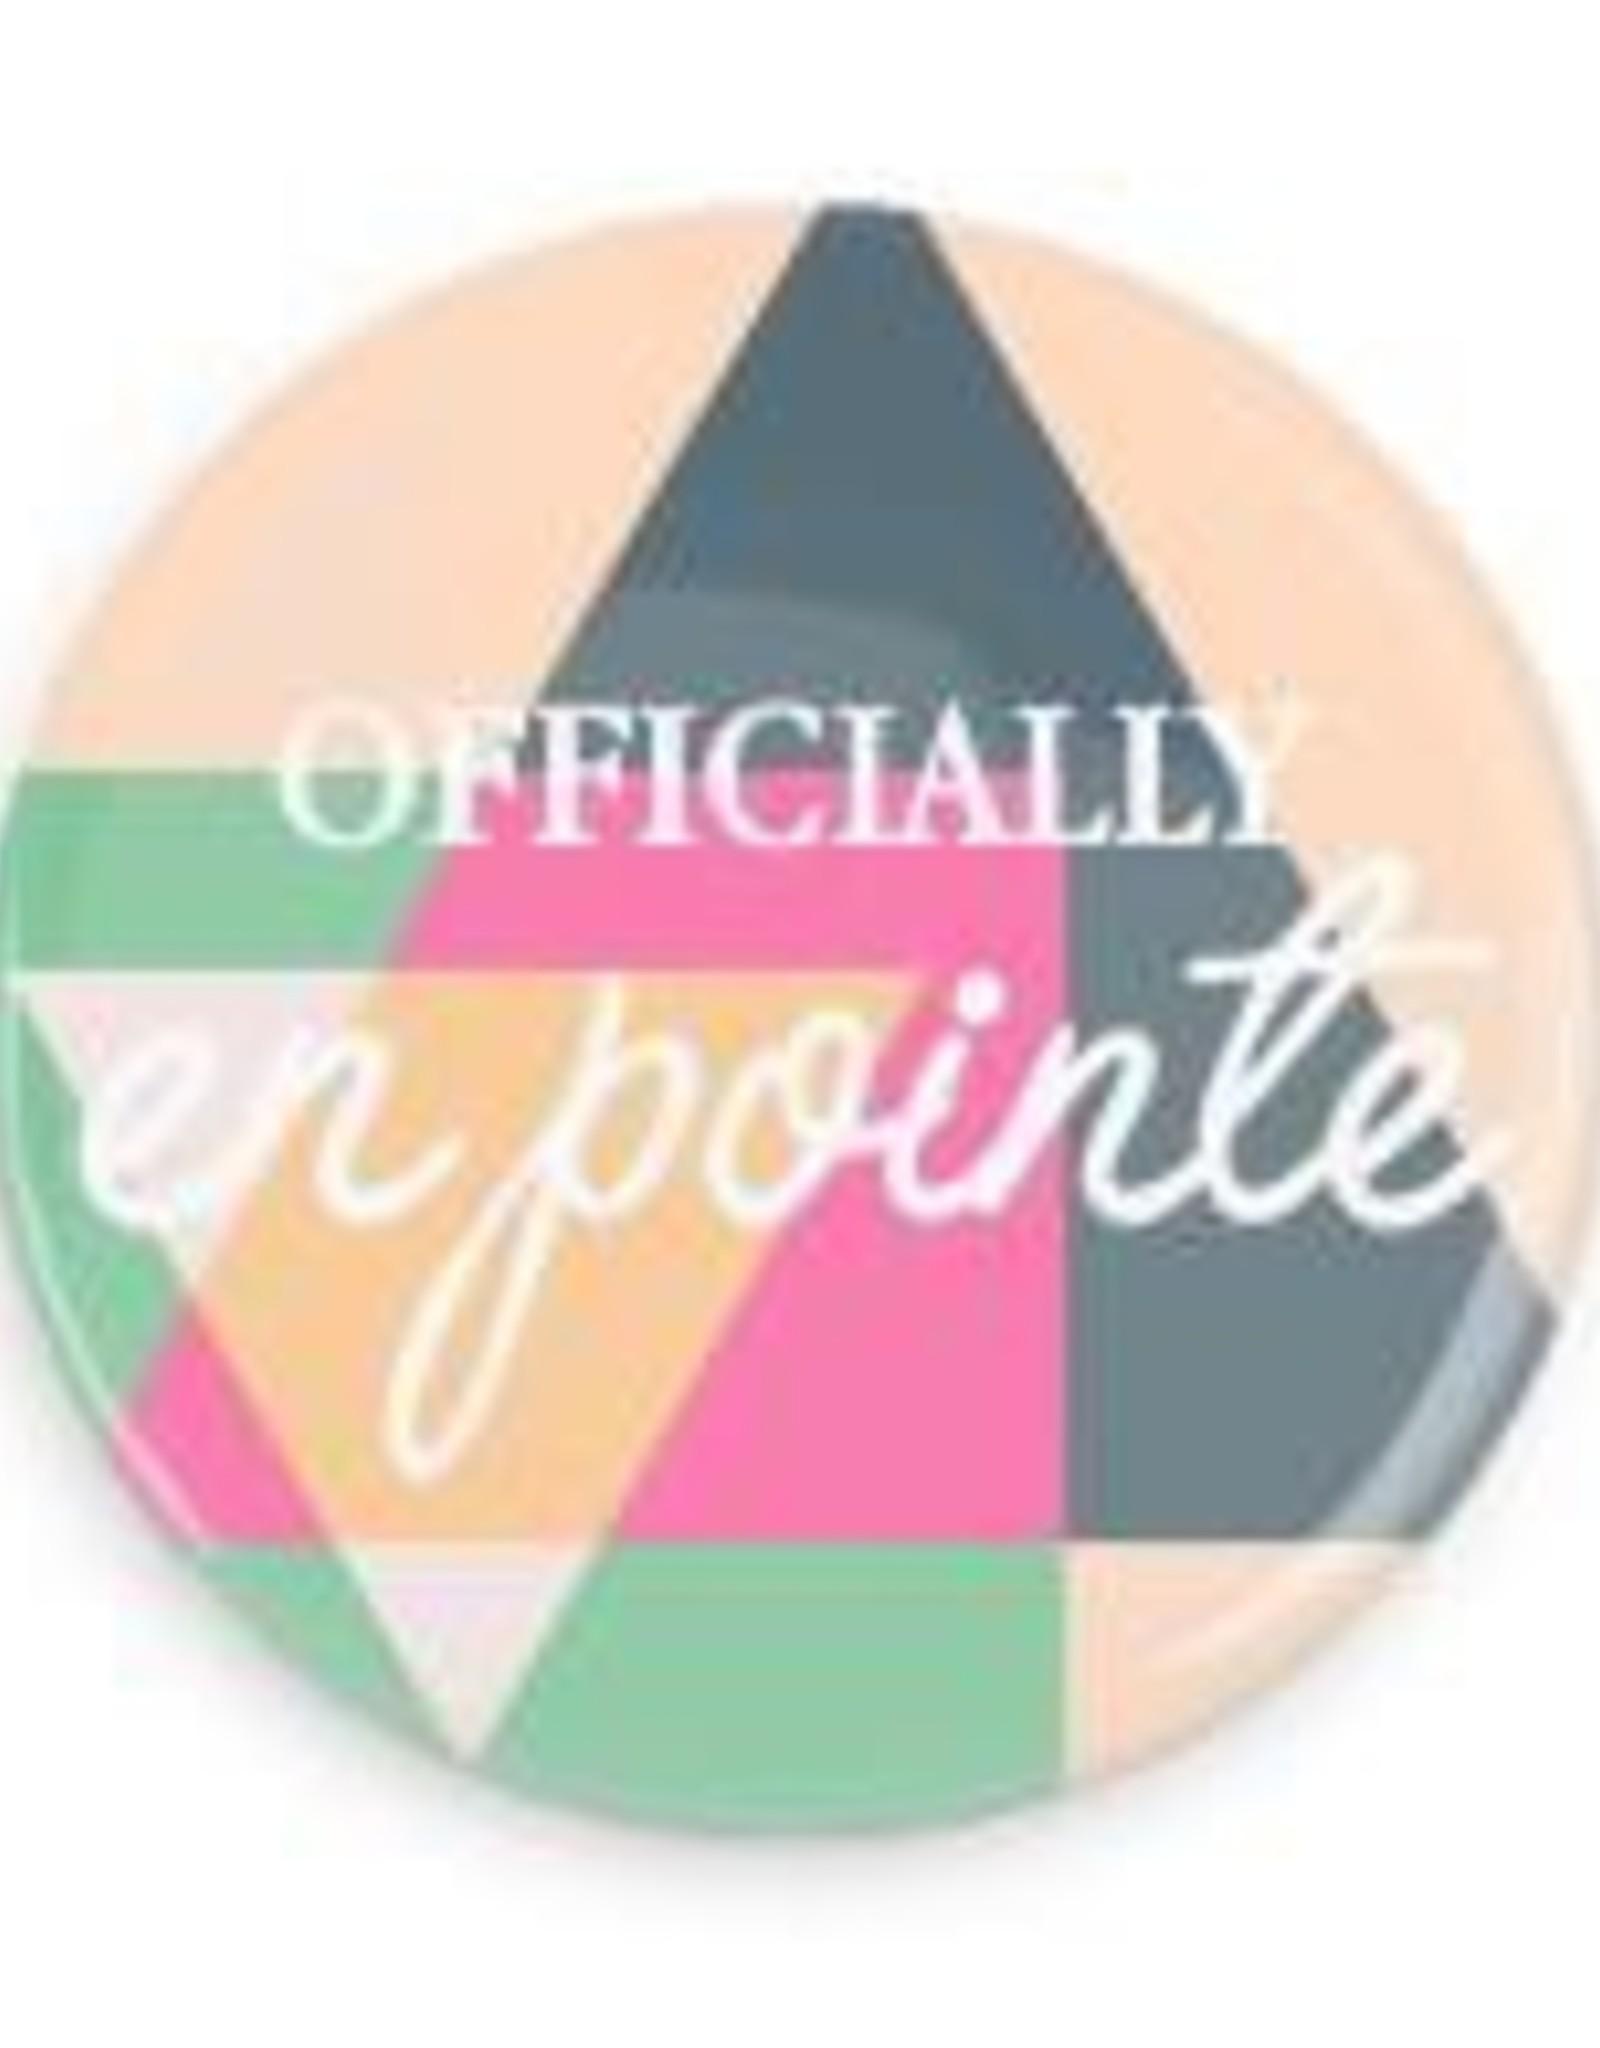 "B+ Printworks 750CC69 3"" Mirror - Officially en Pointe (Triangle)"